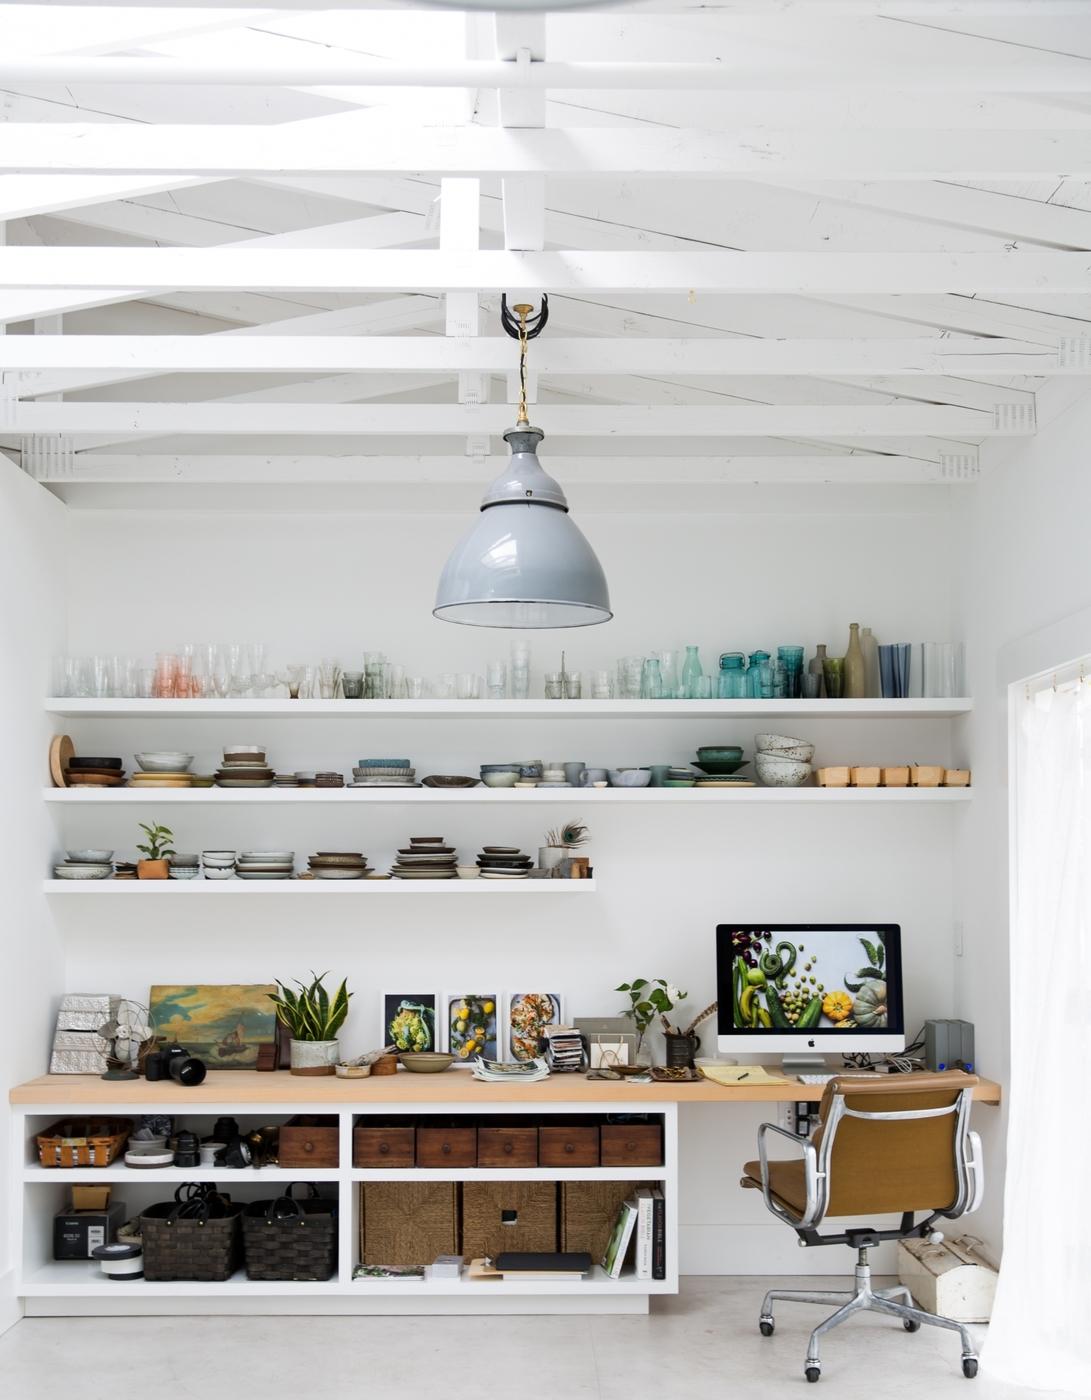 erin-scott-photo-studio-kitchen-office-1466x1881.jpg